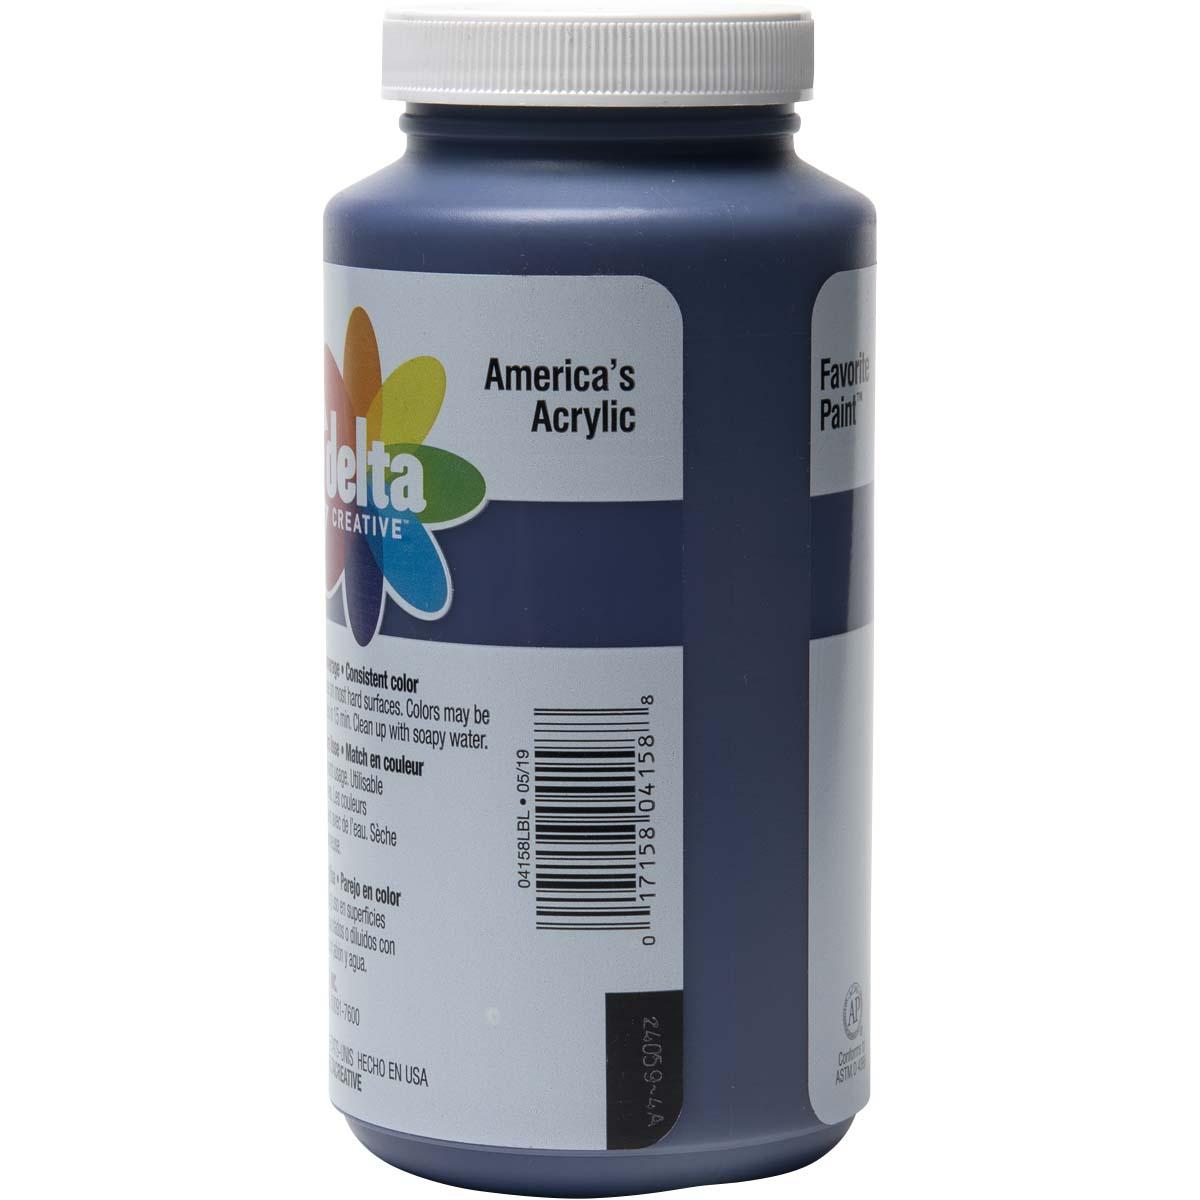 Delta Ceramcoat ® Acrylic Paint - Purple, 16 oz. - 04158